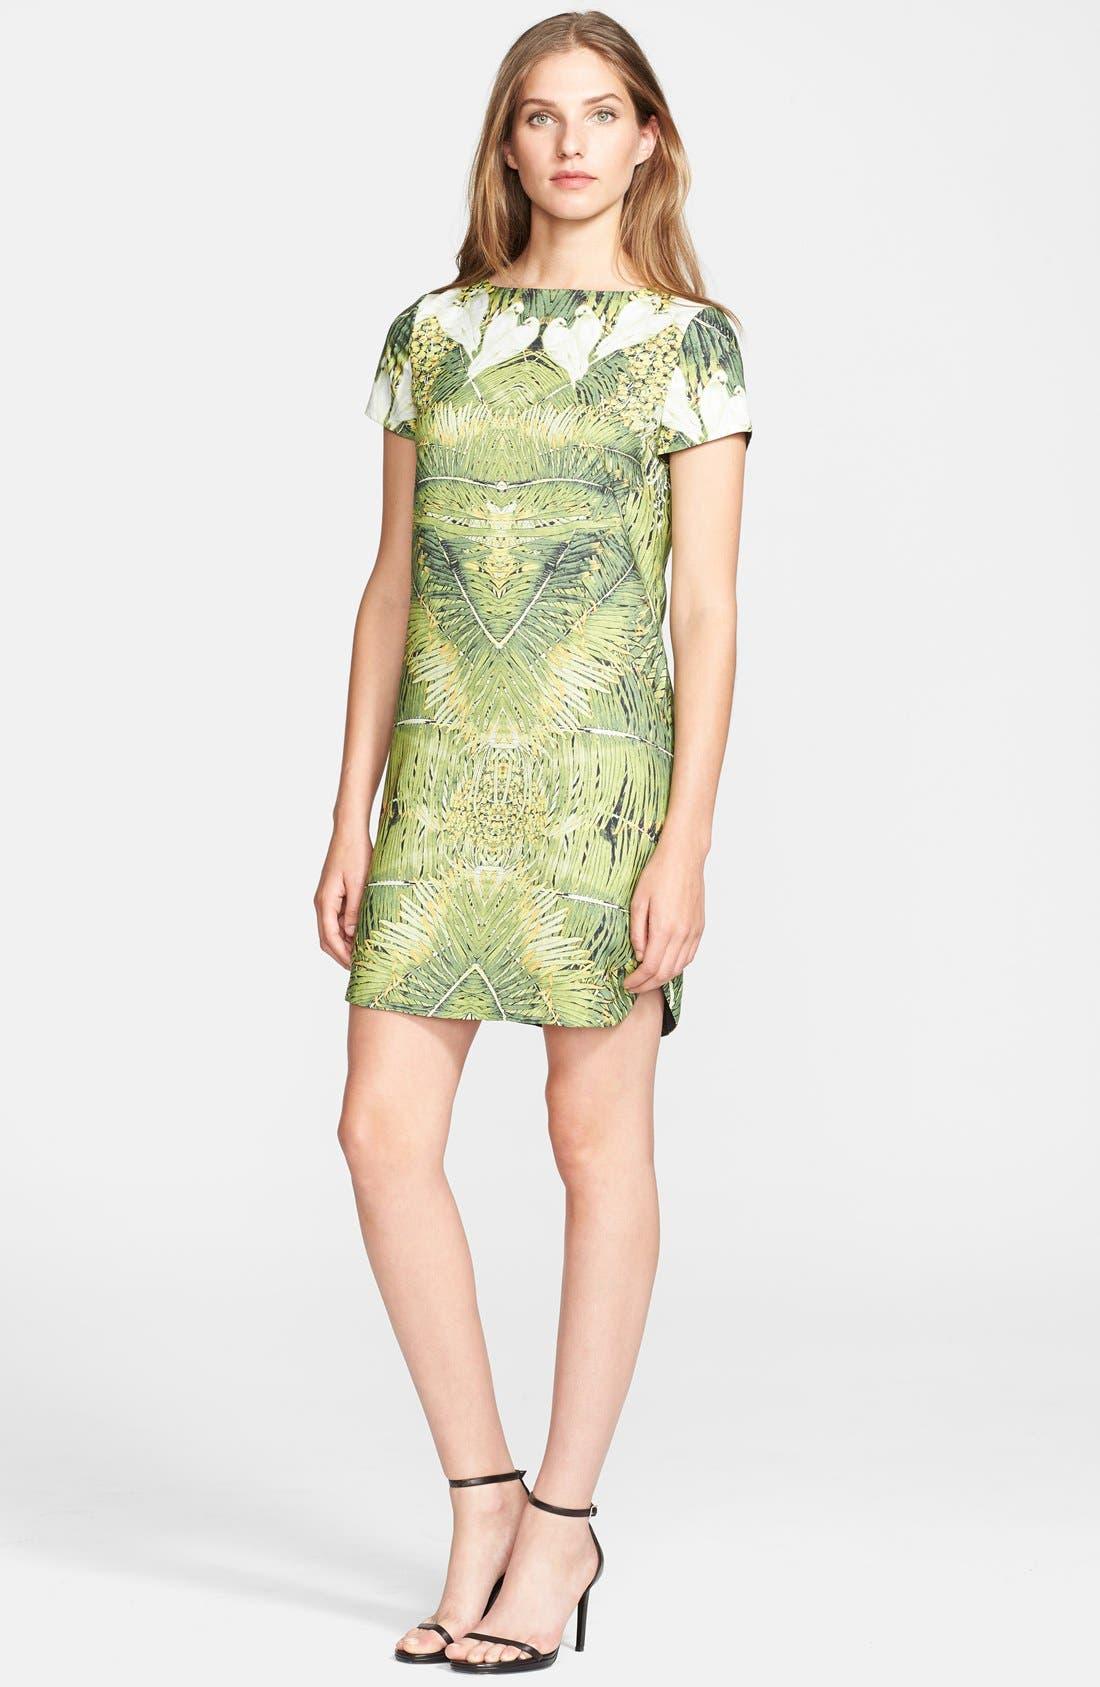 Alternate Image 1 Selected - Ted Baker London 'Tropical Doves' Print Woven Tunic Dress